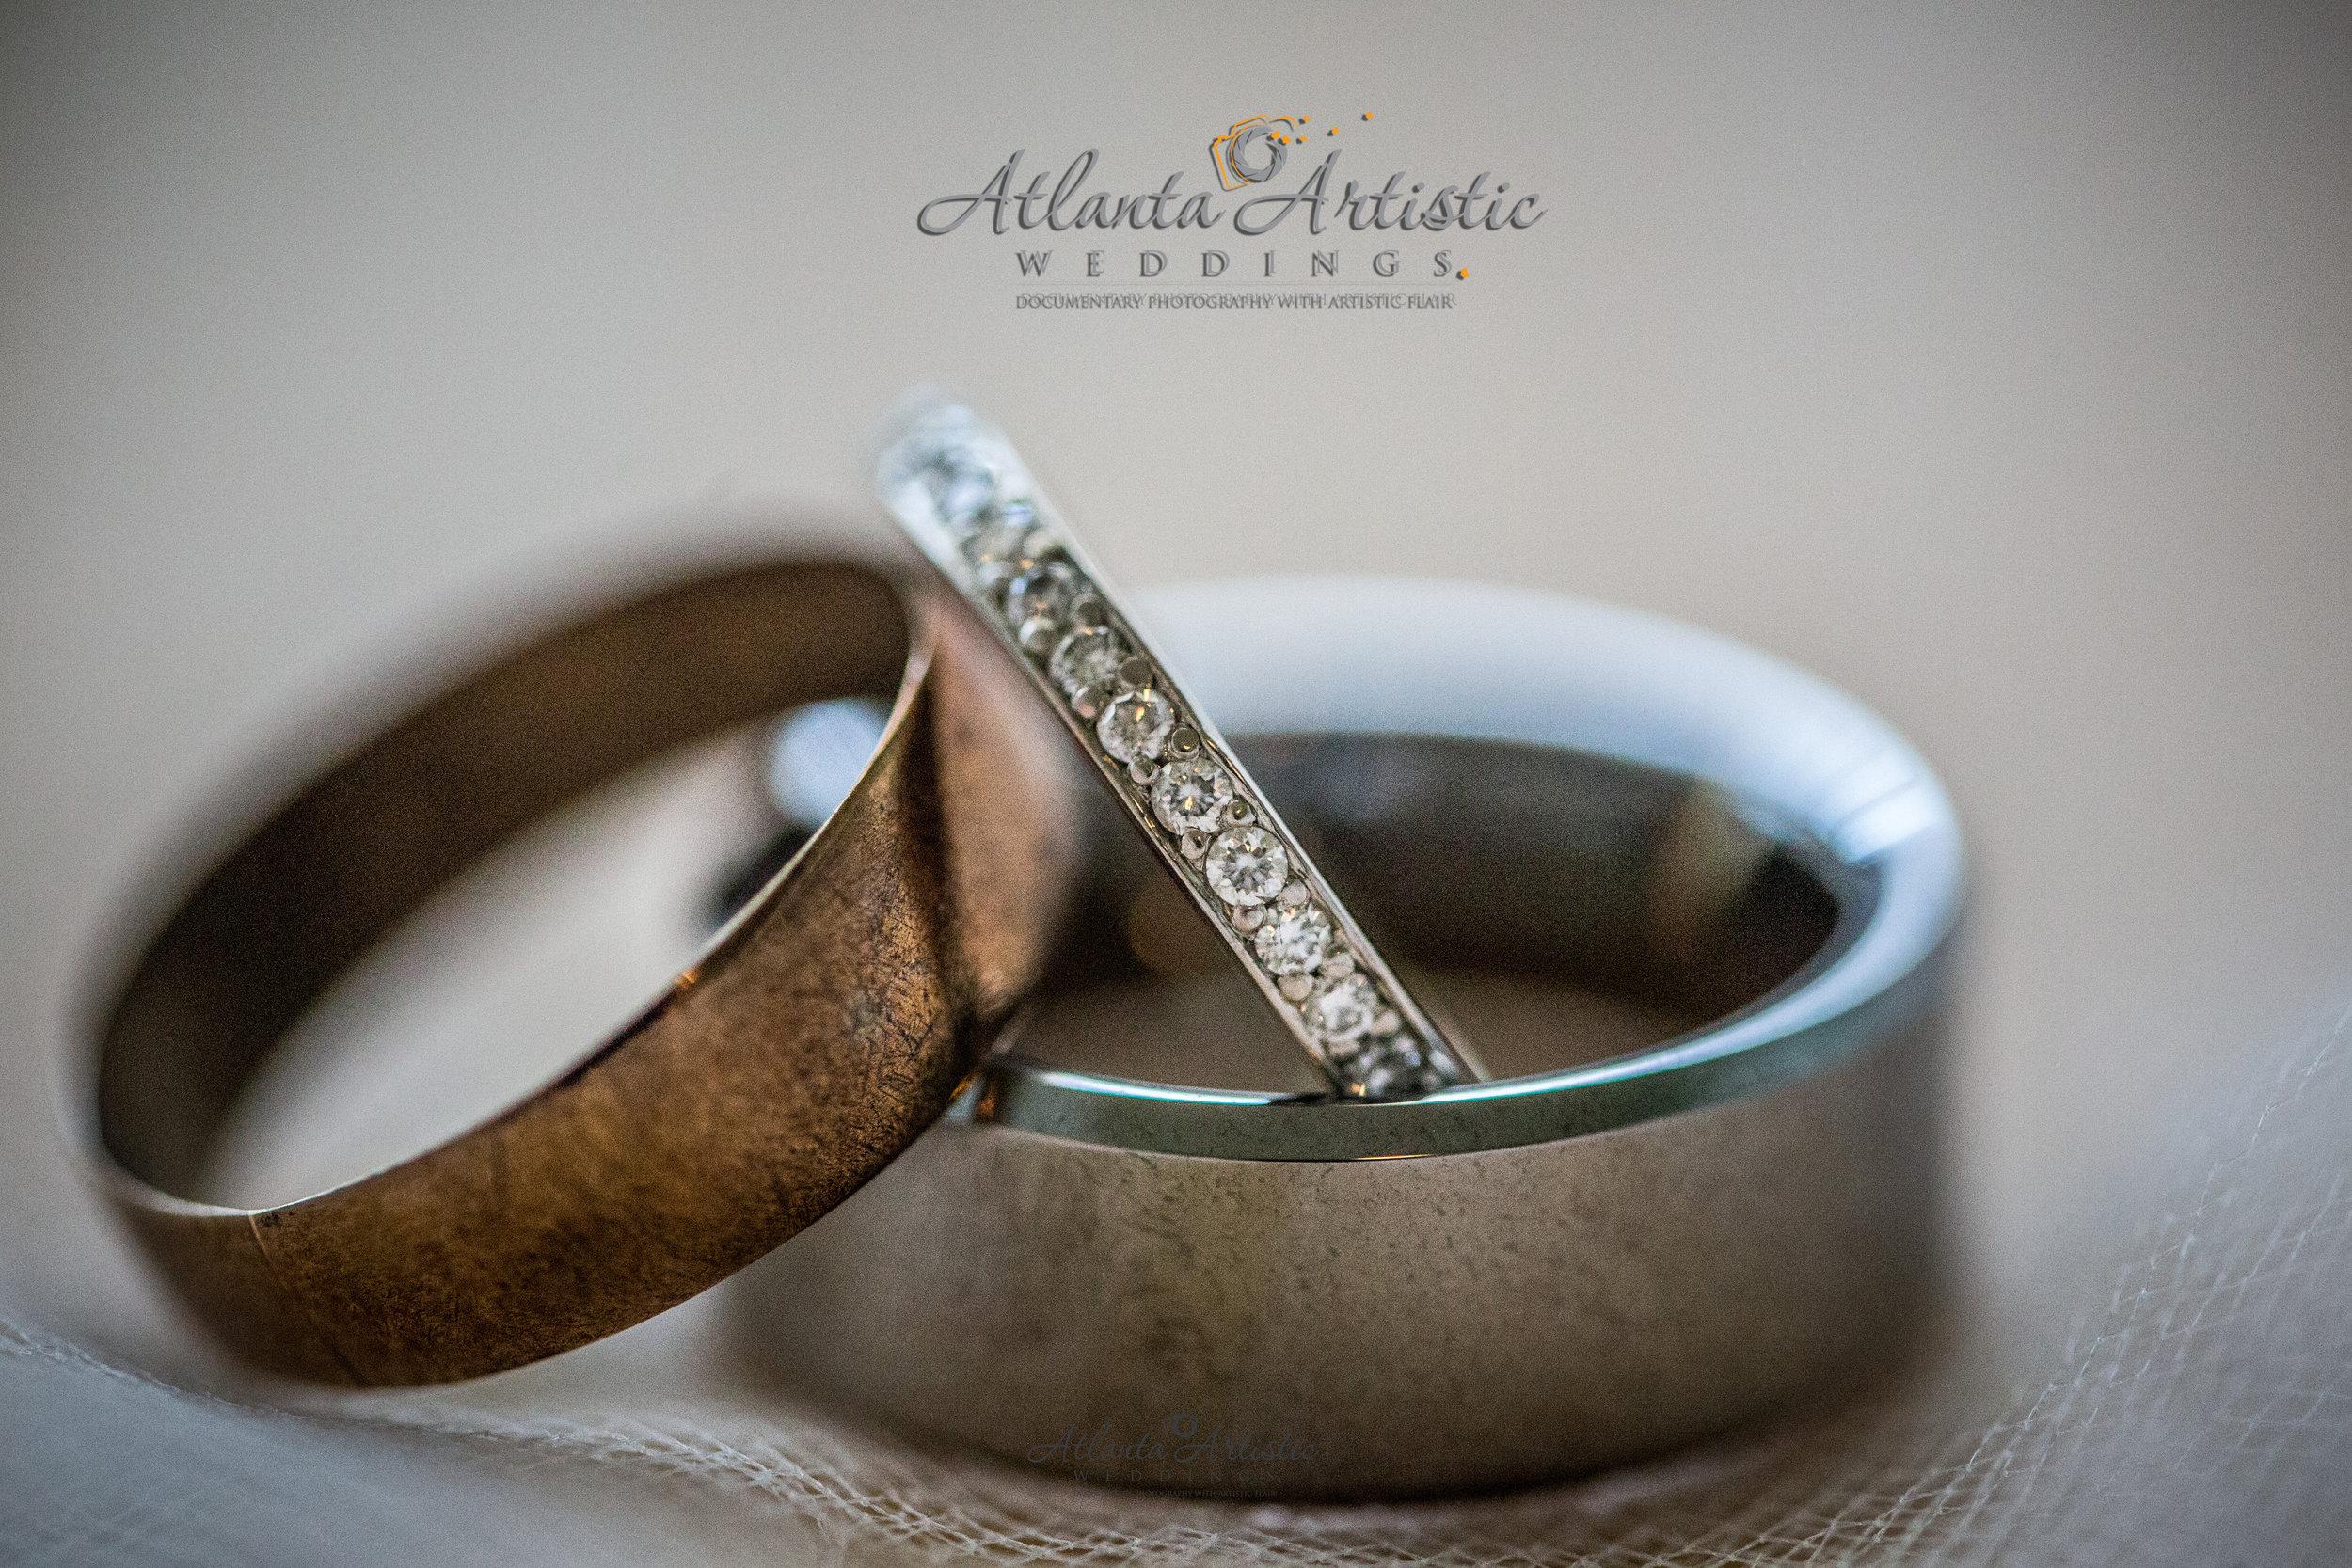 Grandmothers Ring used at Atlanta Wedding, photography by AtlantaArtisticWeddings